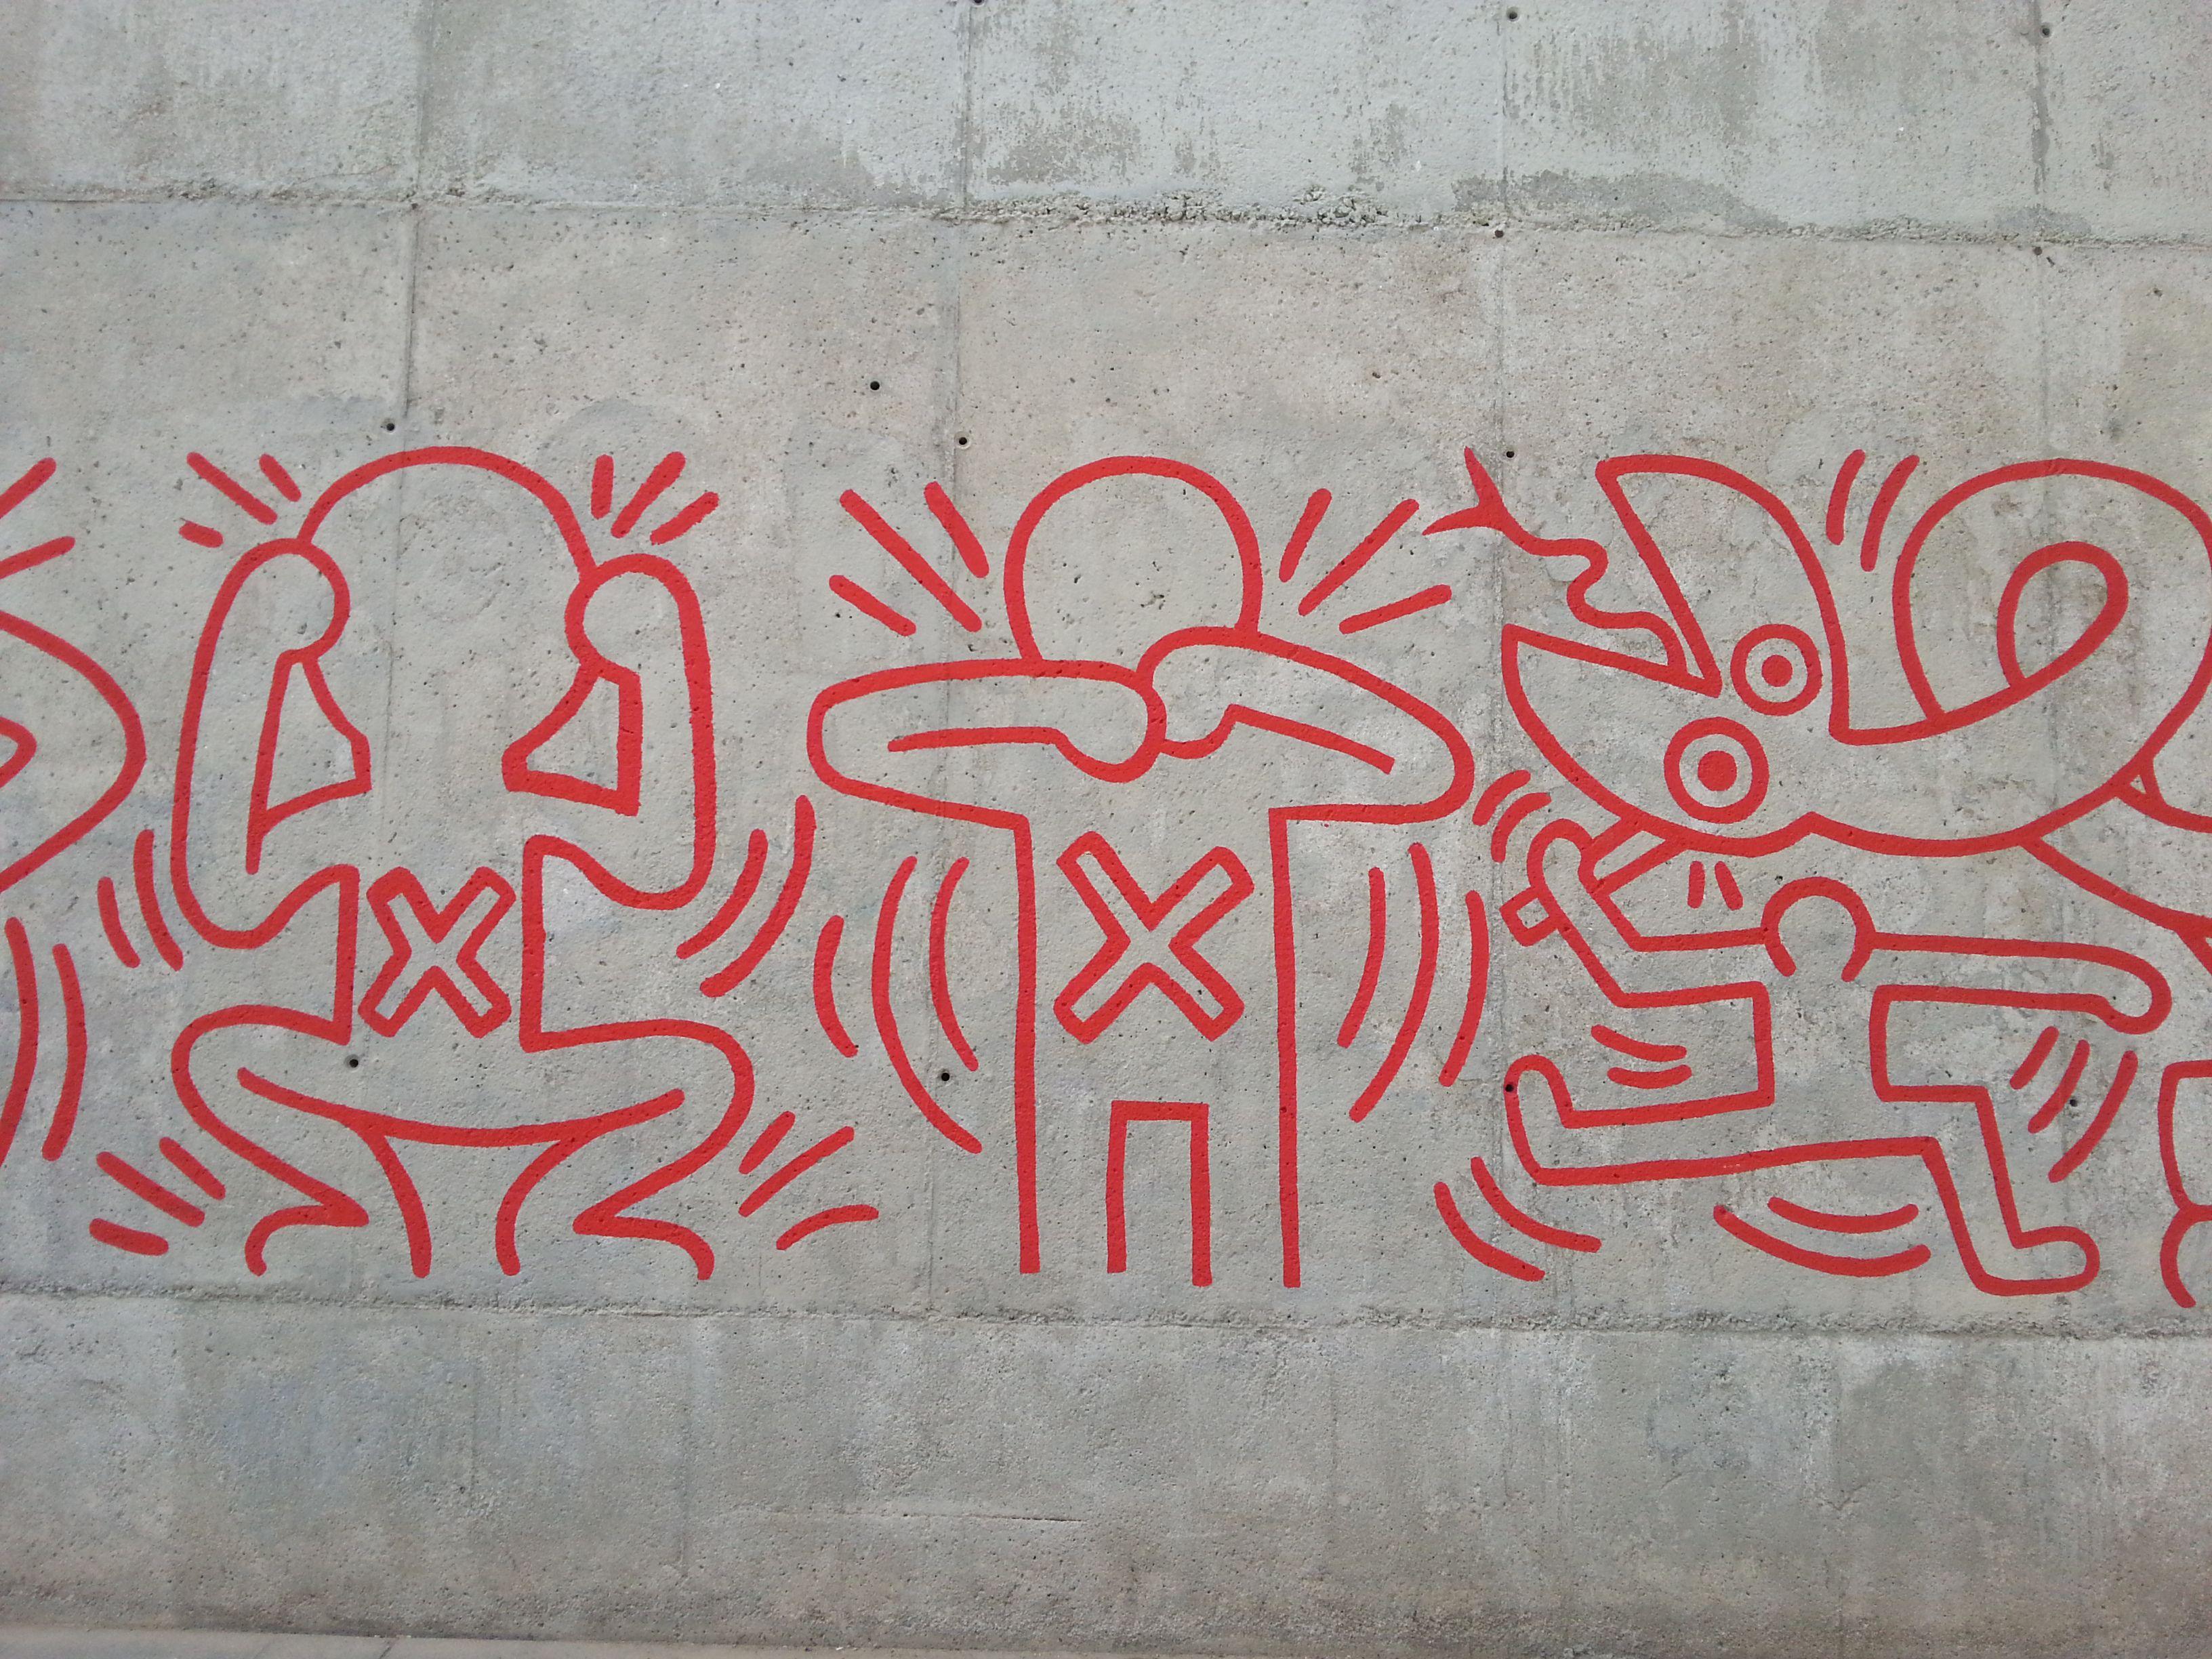 Jardins museu CCBB #ArtUrbaBARCELONA  #GRAFFITImural #ArtSocietatEducacio2014